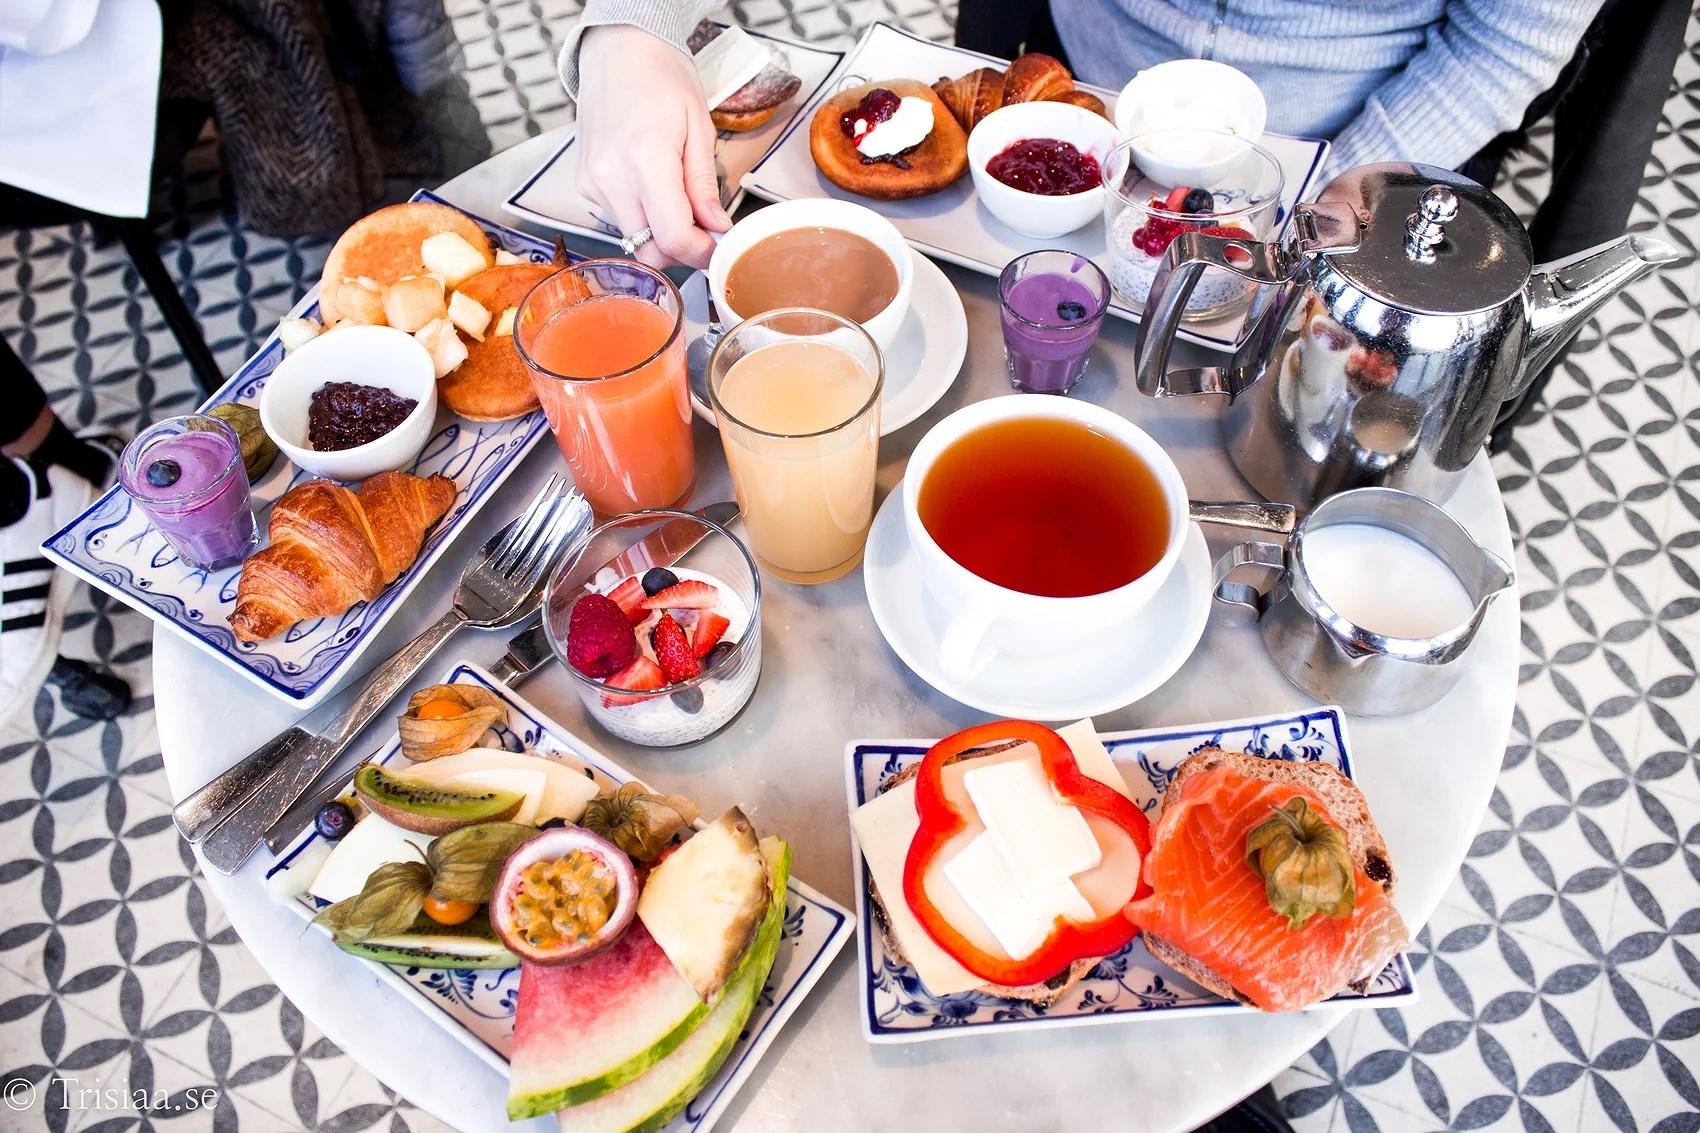 Frukost på Berns!